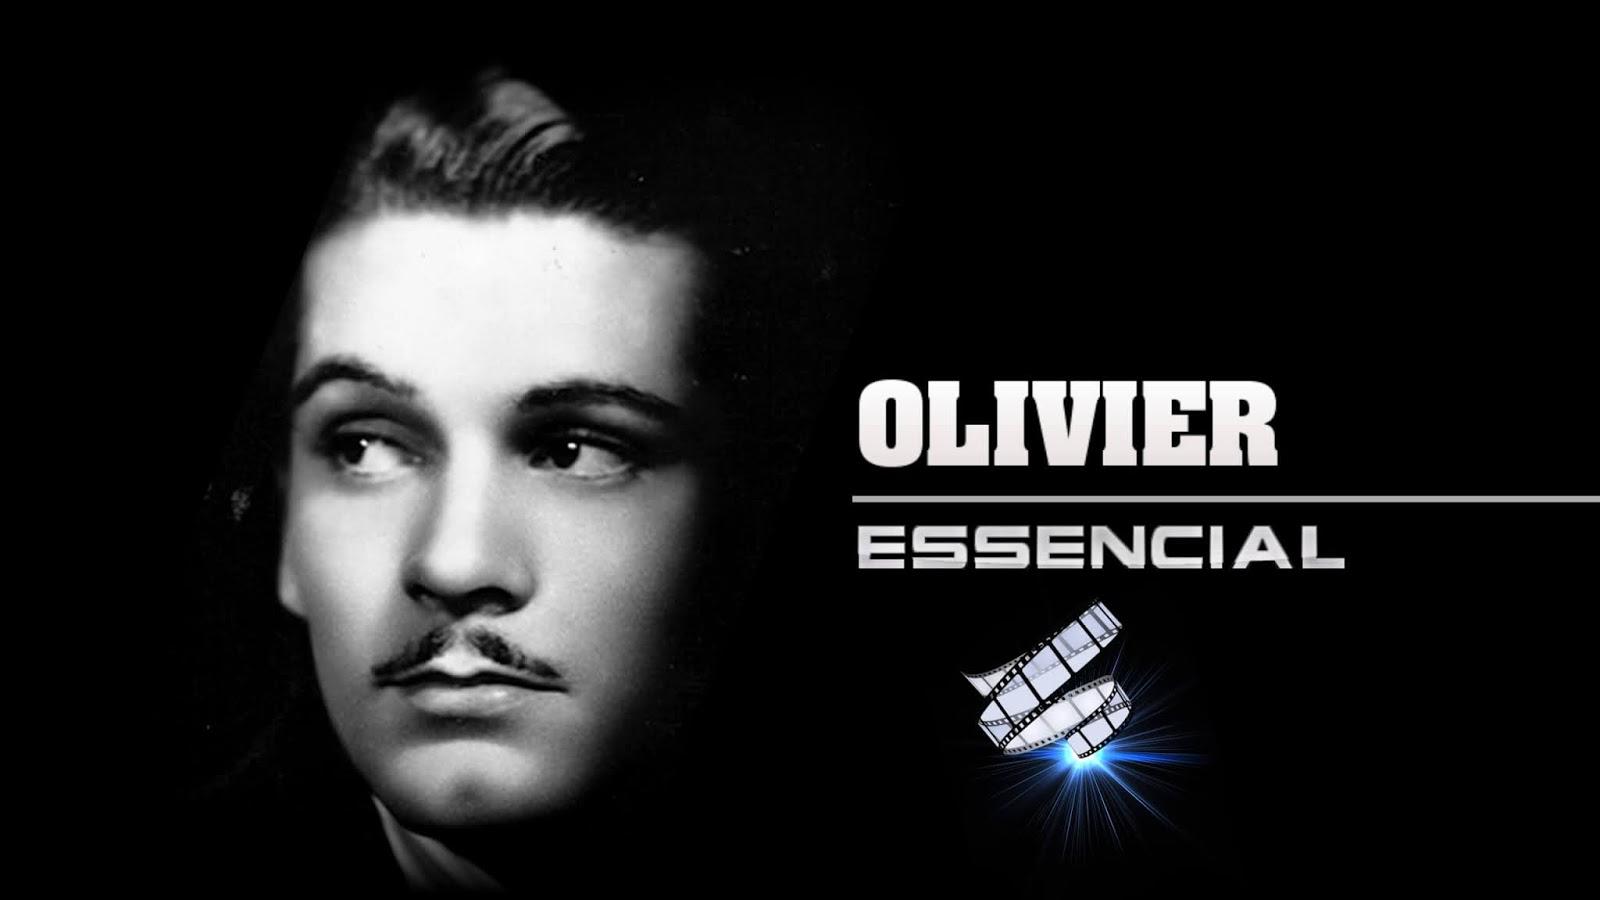 laurence-olivier-10-filmes-essenciais